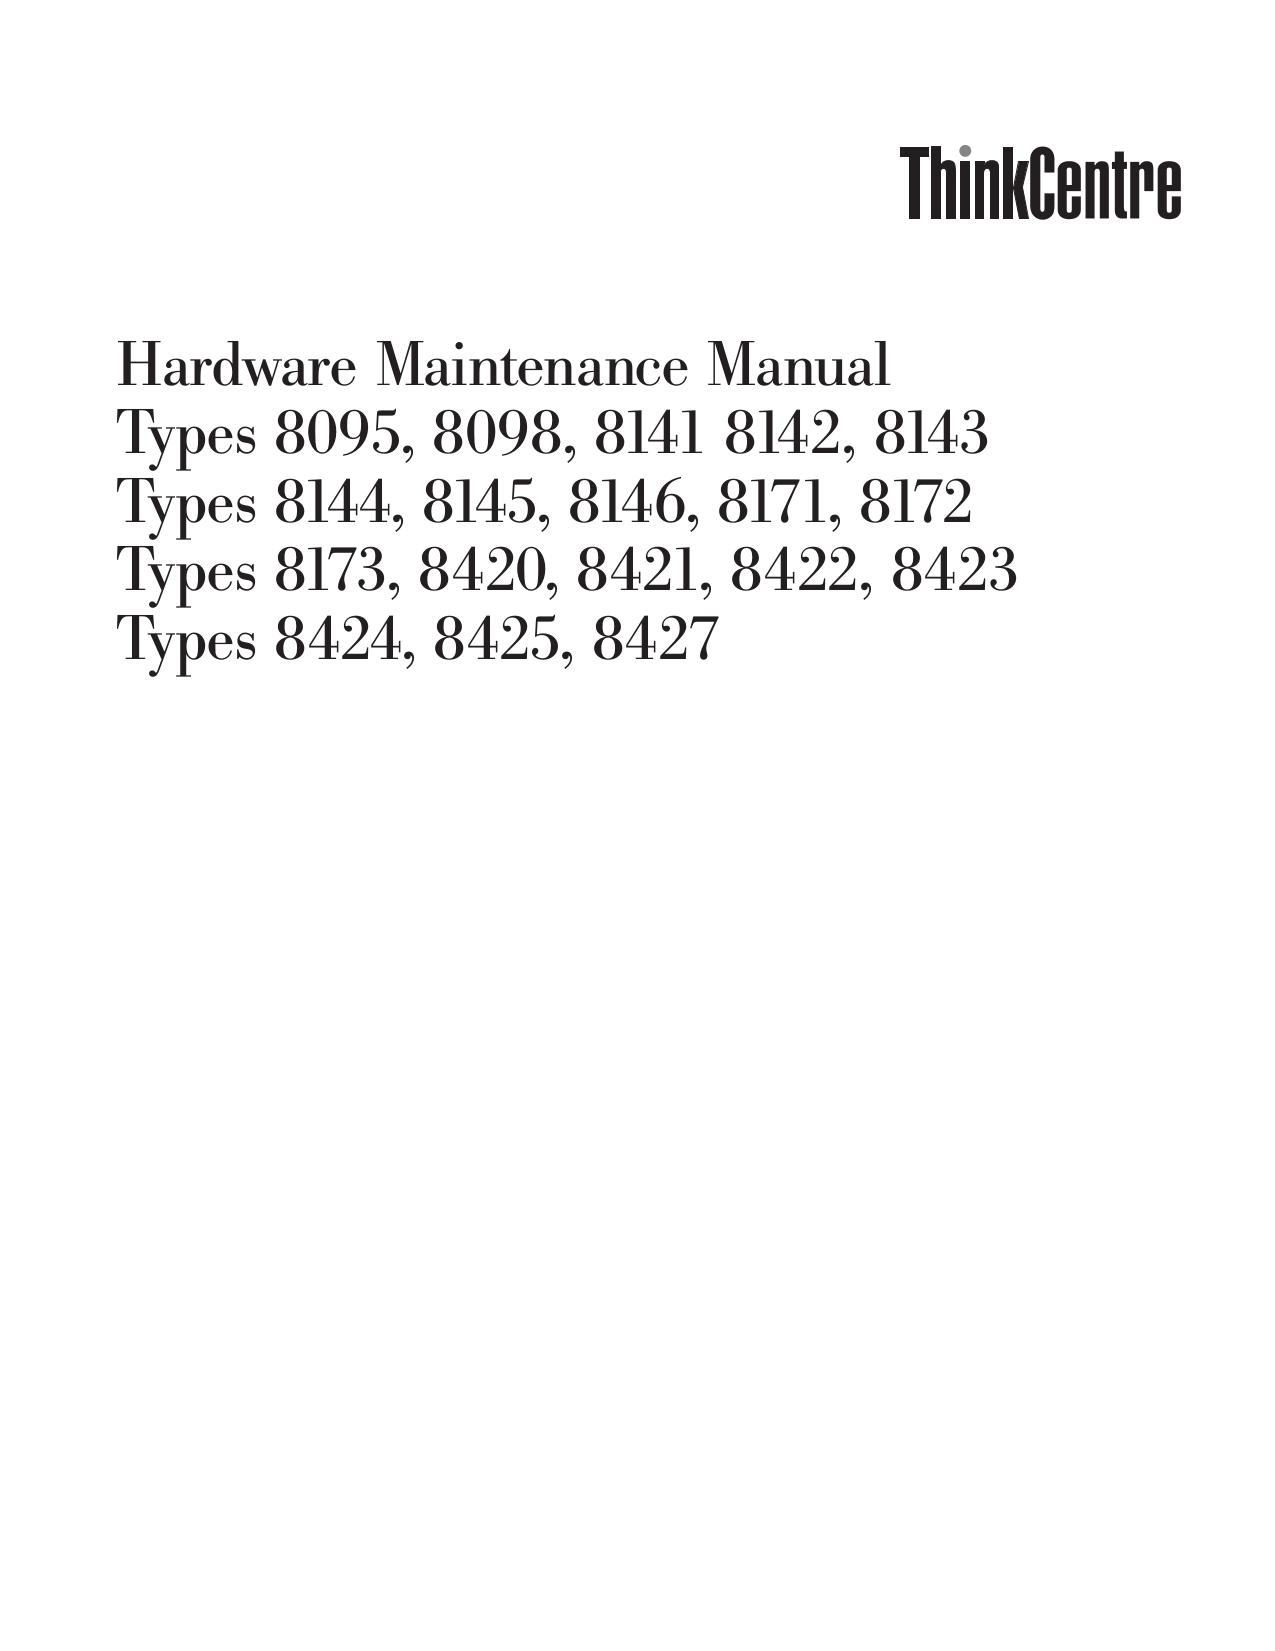 pdf for Lenovo Desktop ThinkCentre A51p 8423 manual